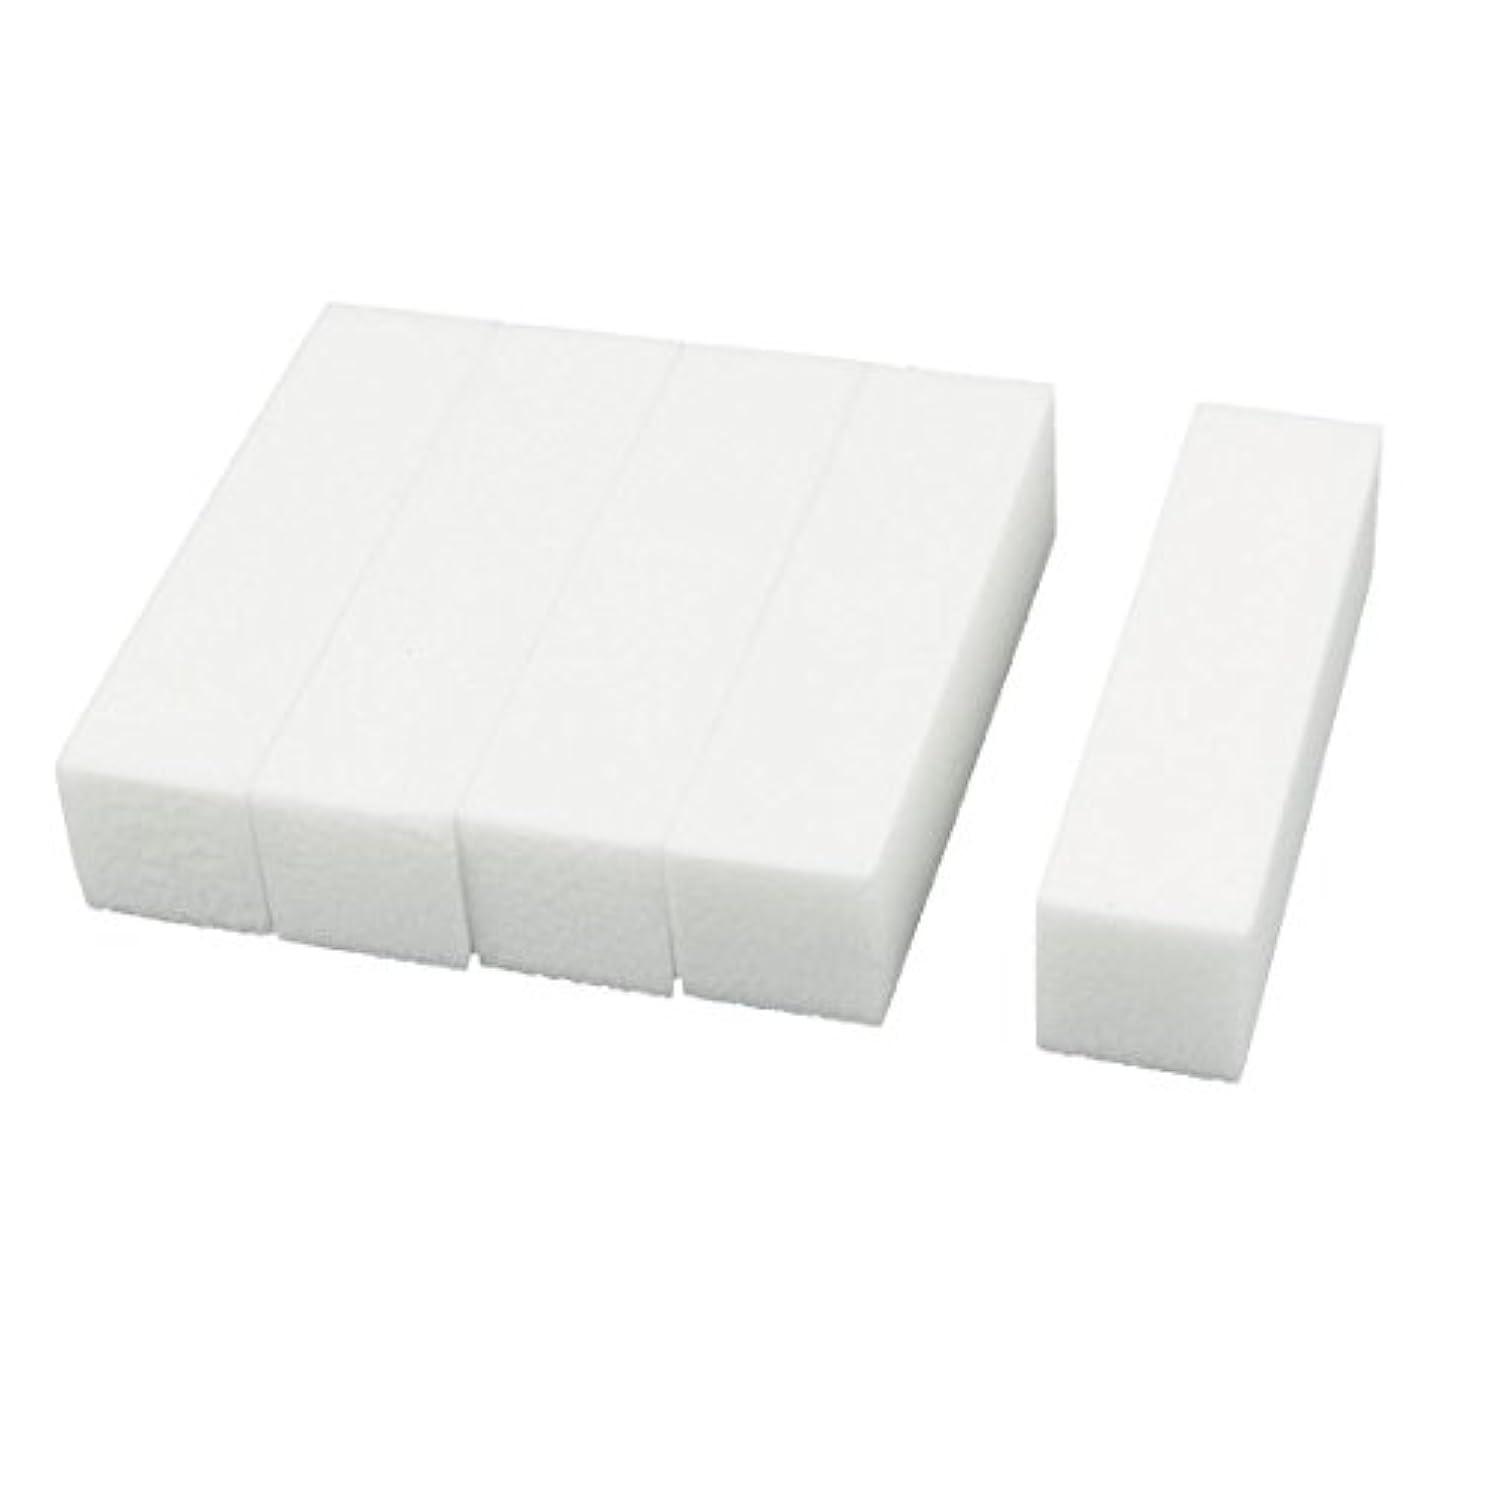 uxcell ネイルファイル サンディングブロック ヒント マニキュアツール バッファ ホワイト 4ウェイ 5個セット